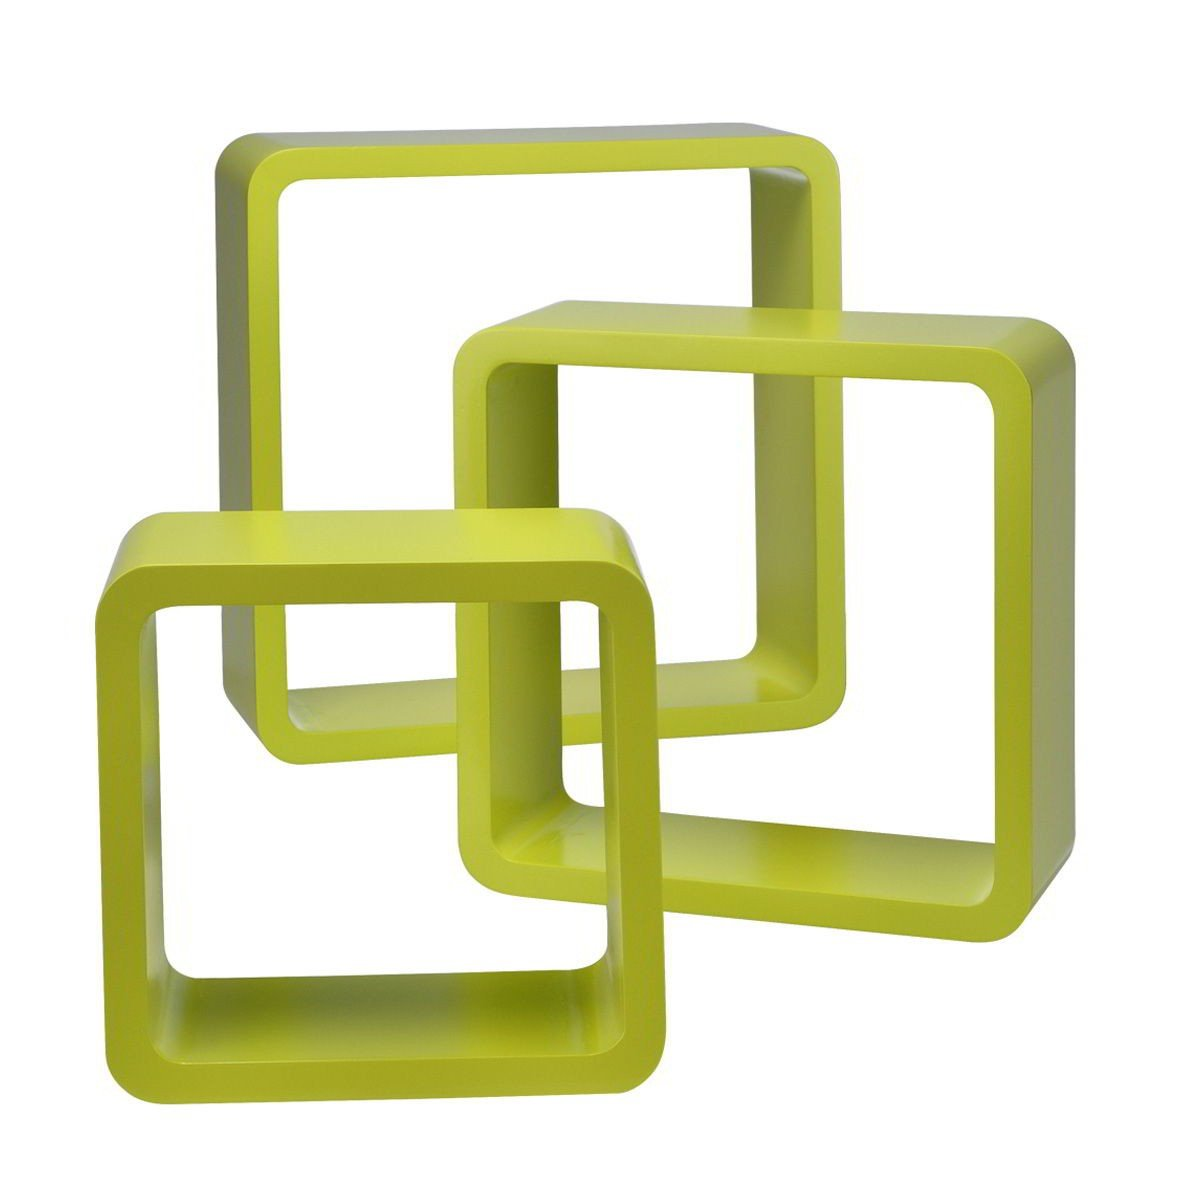 Wandregal würfel holz  Wandregale Würfel 3erSet quadratisch Cube Hängeregale Retro Design ...